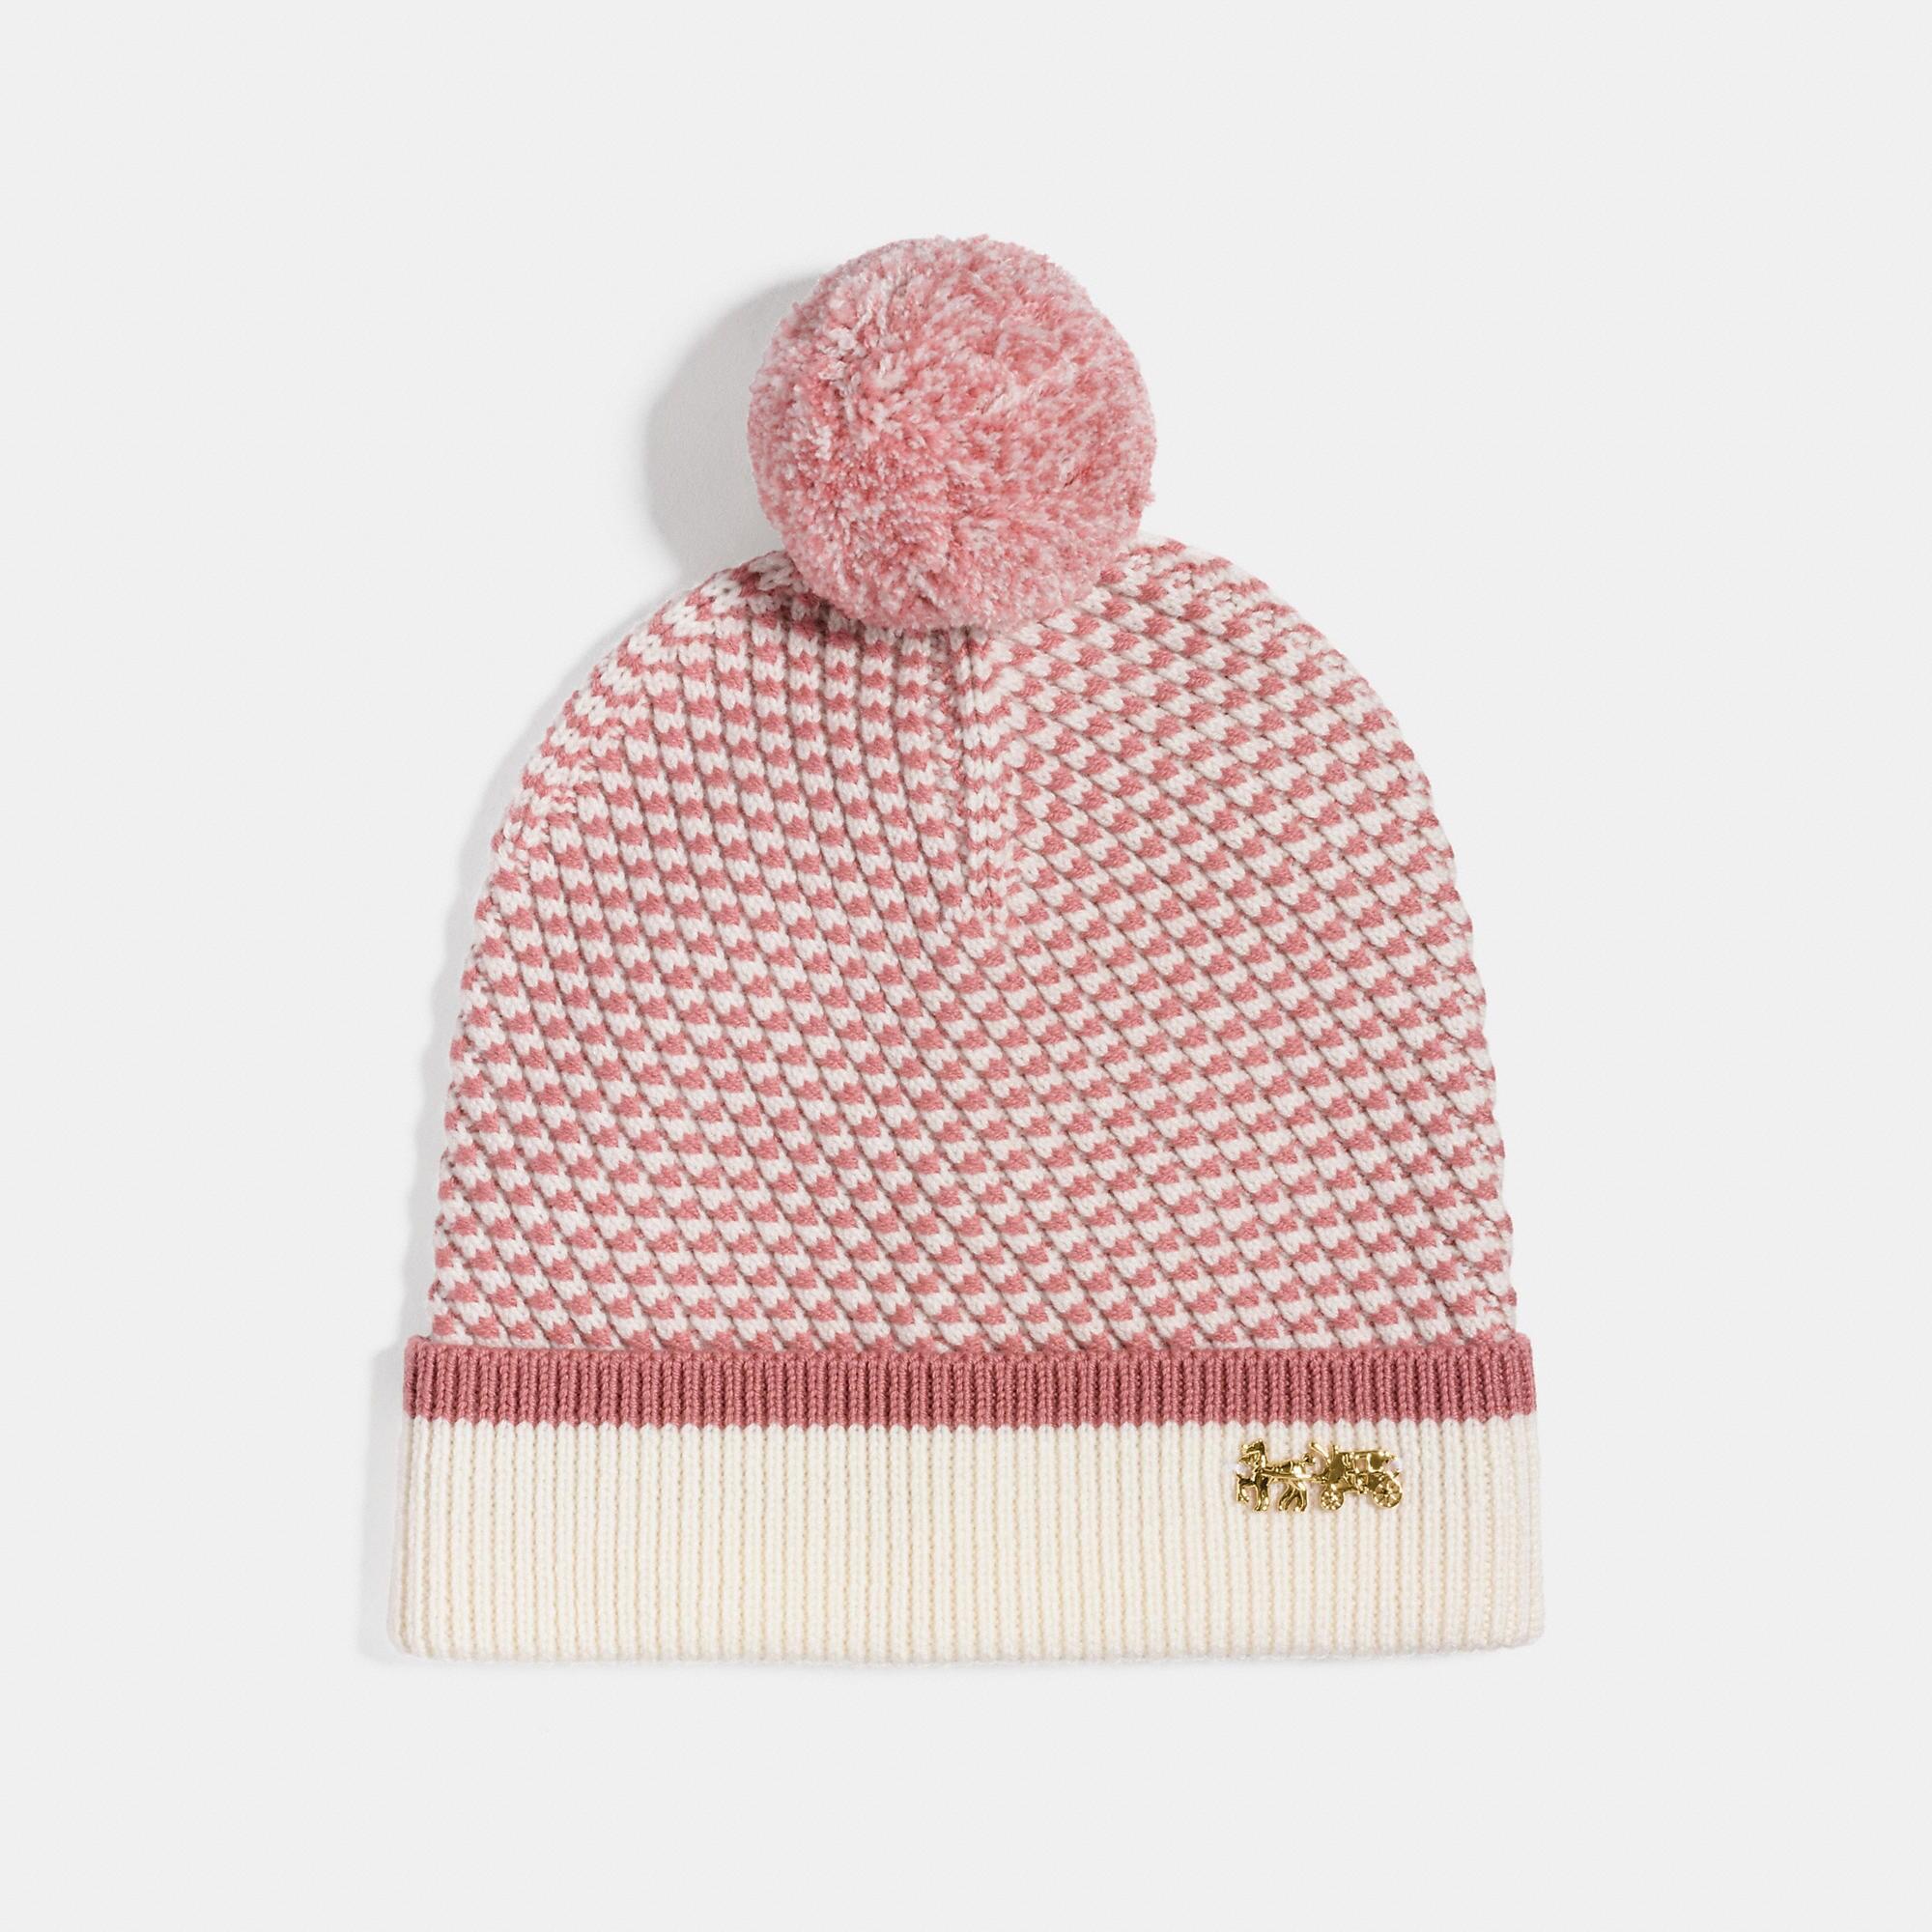 Coach Charm Knit Hat